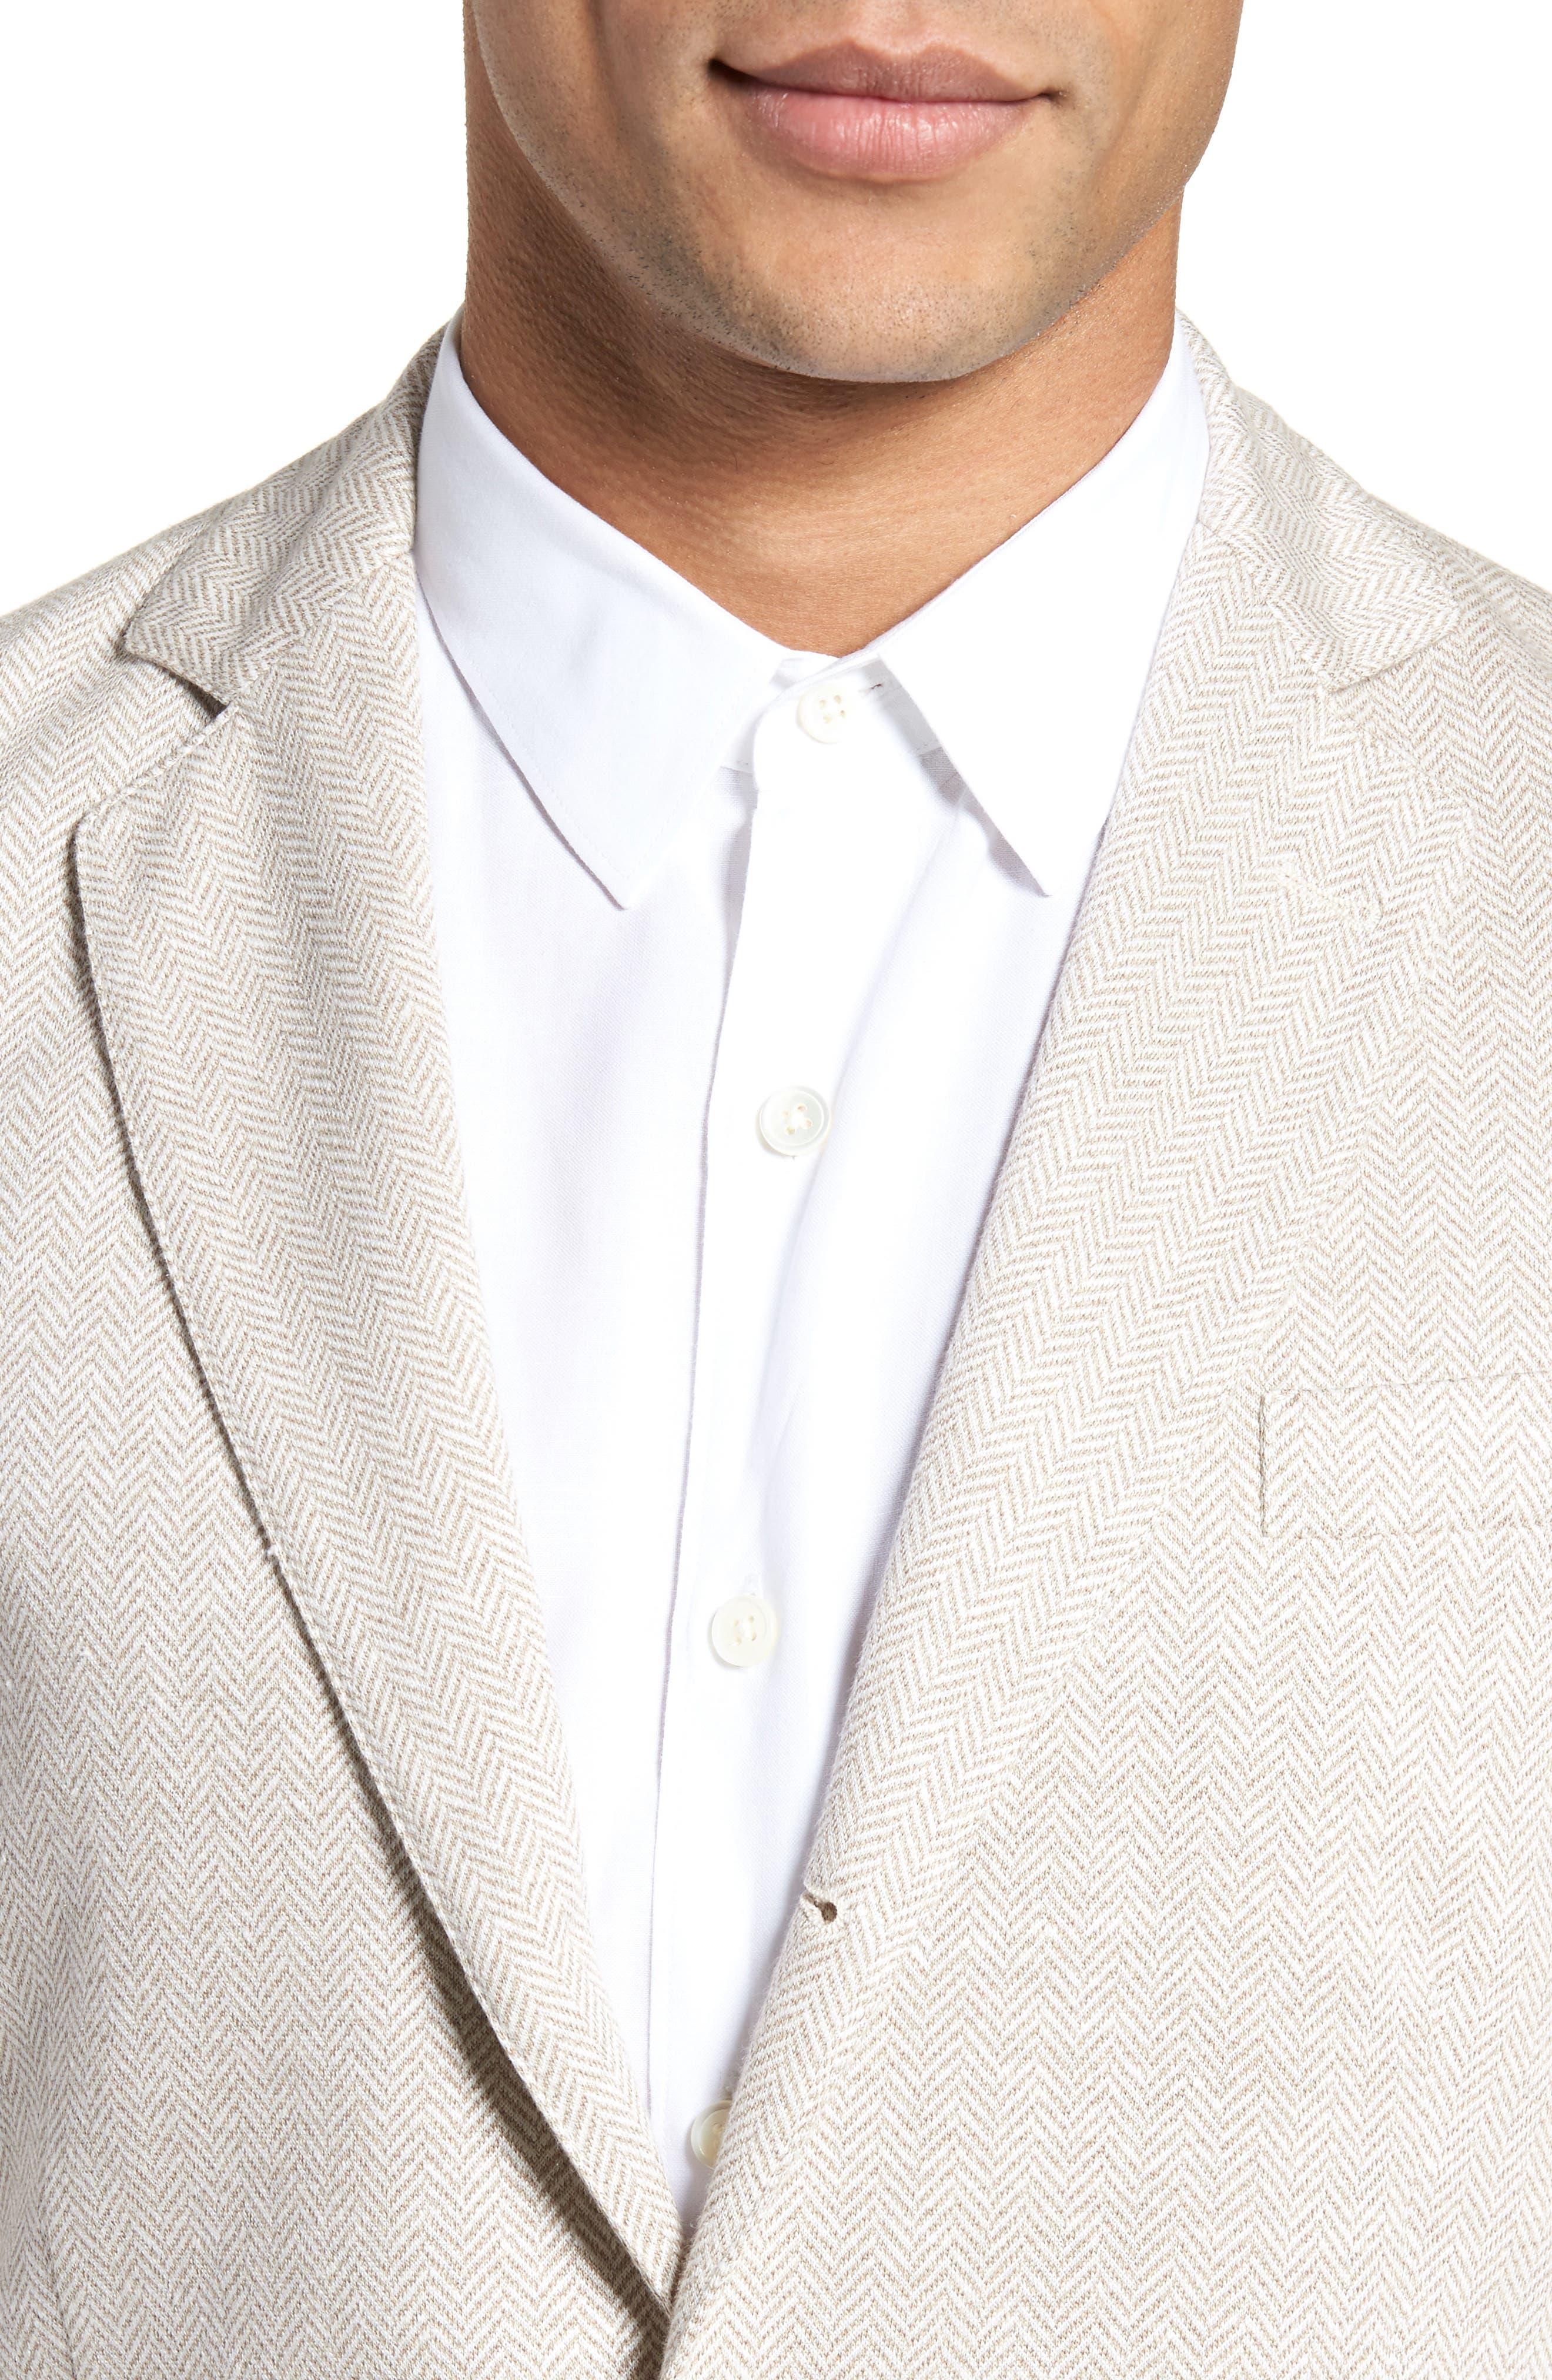 Trim Fit Herringbone Linen & Cotton Jacket,                             Alternate thumbnail 4, color,                             231